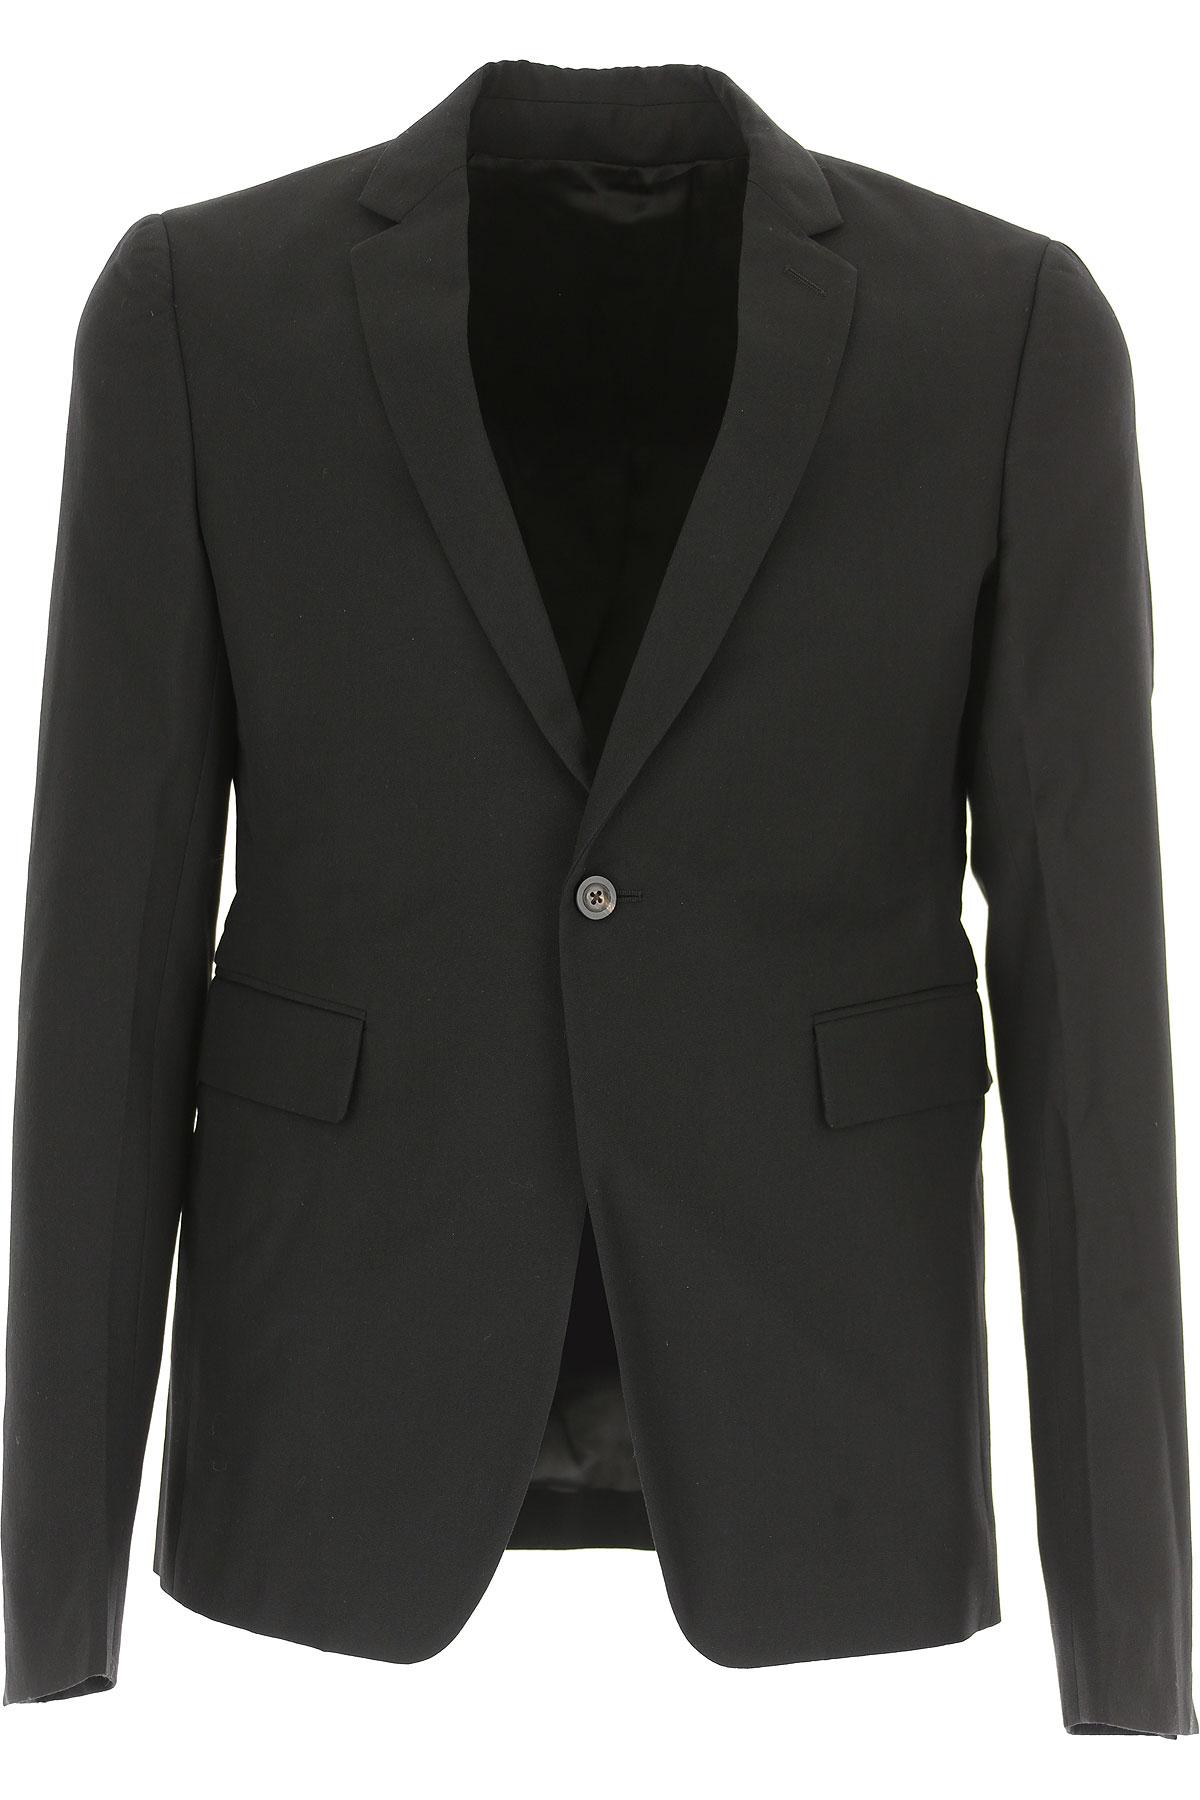 Image of Rick Owens Blazer for Men, Sport Coat, Black, Virgin wool, 2017, L M XL